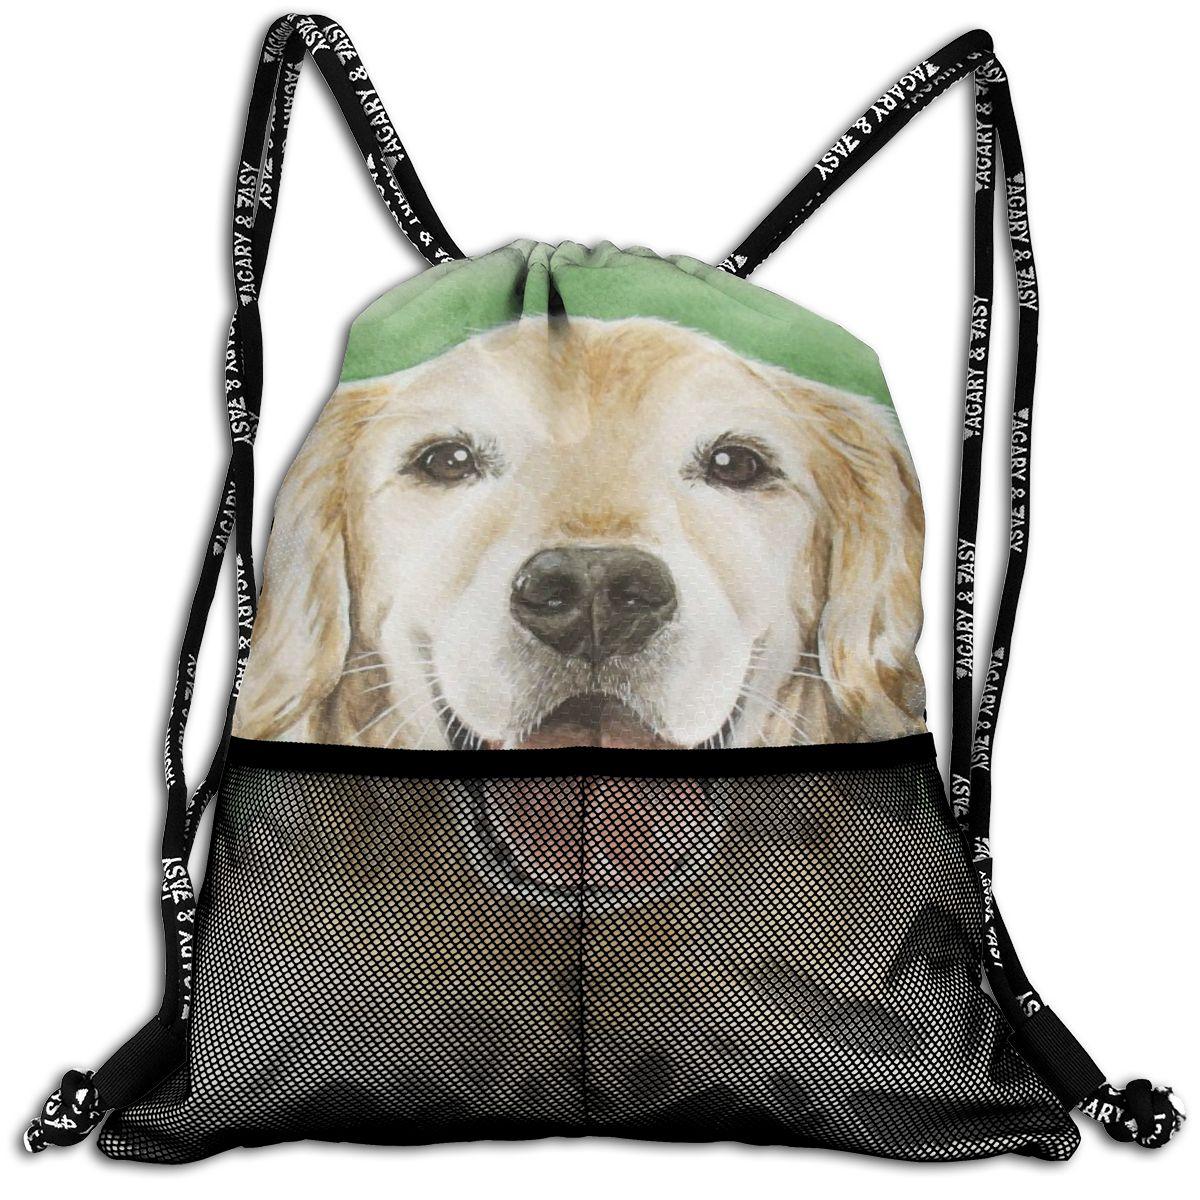 NOISYDESIGNS Golden Retriever Printing Drawstring Backpack Fashion Travel Storage Package Pouch For Women Men Worek Plecak